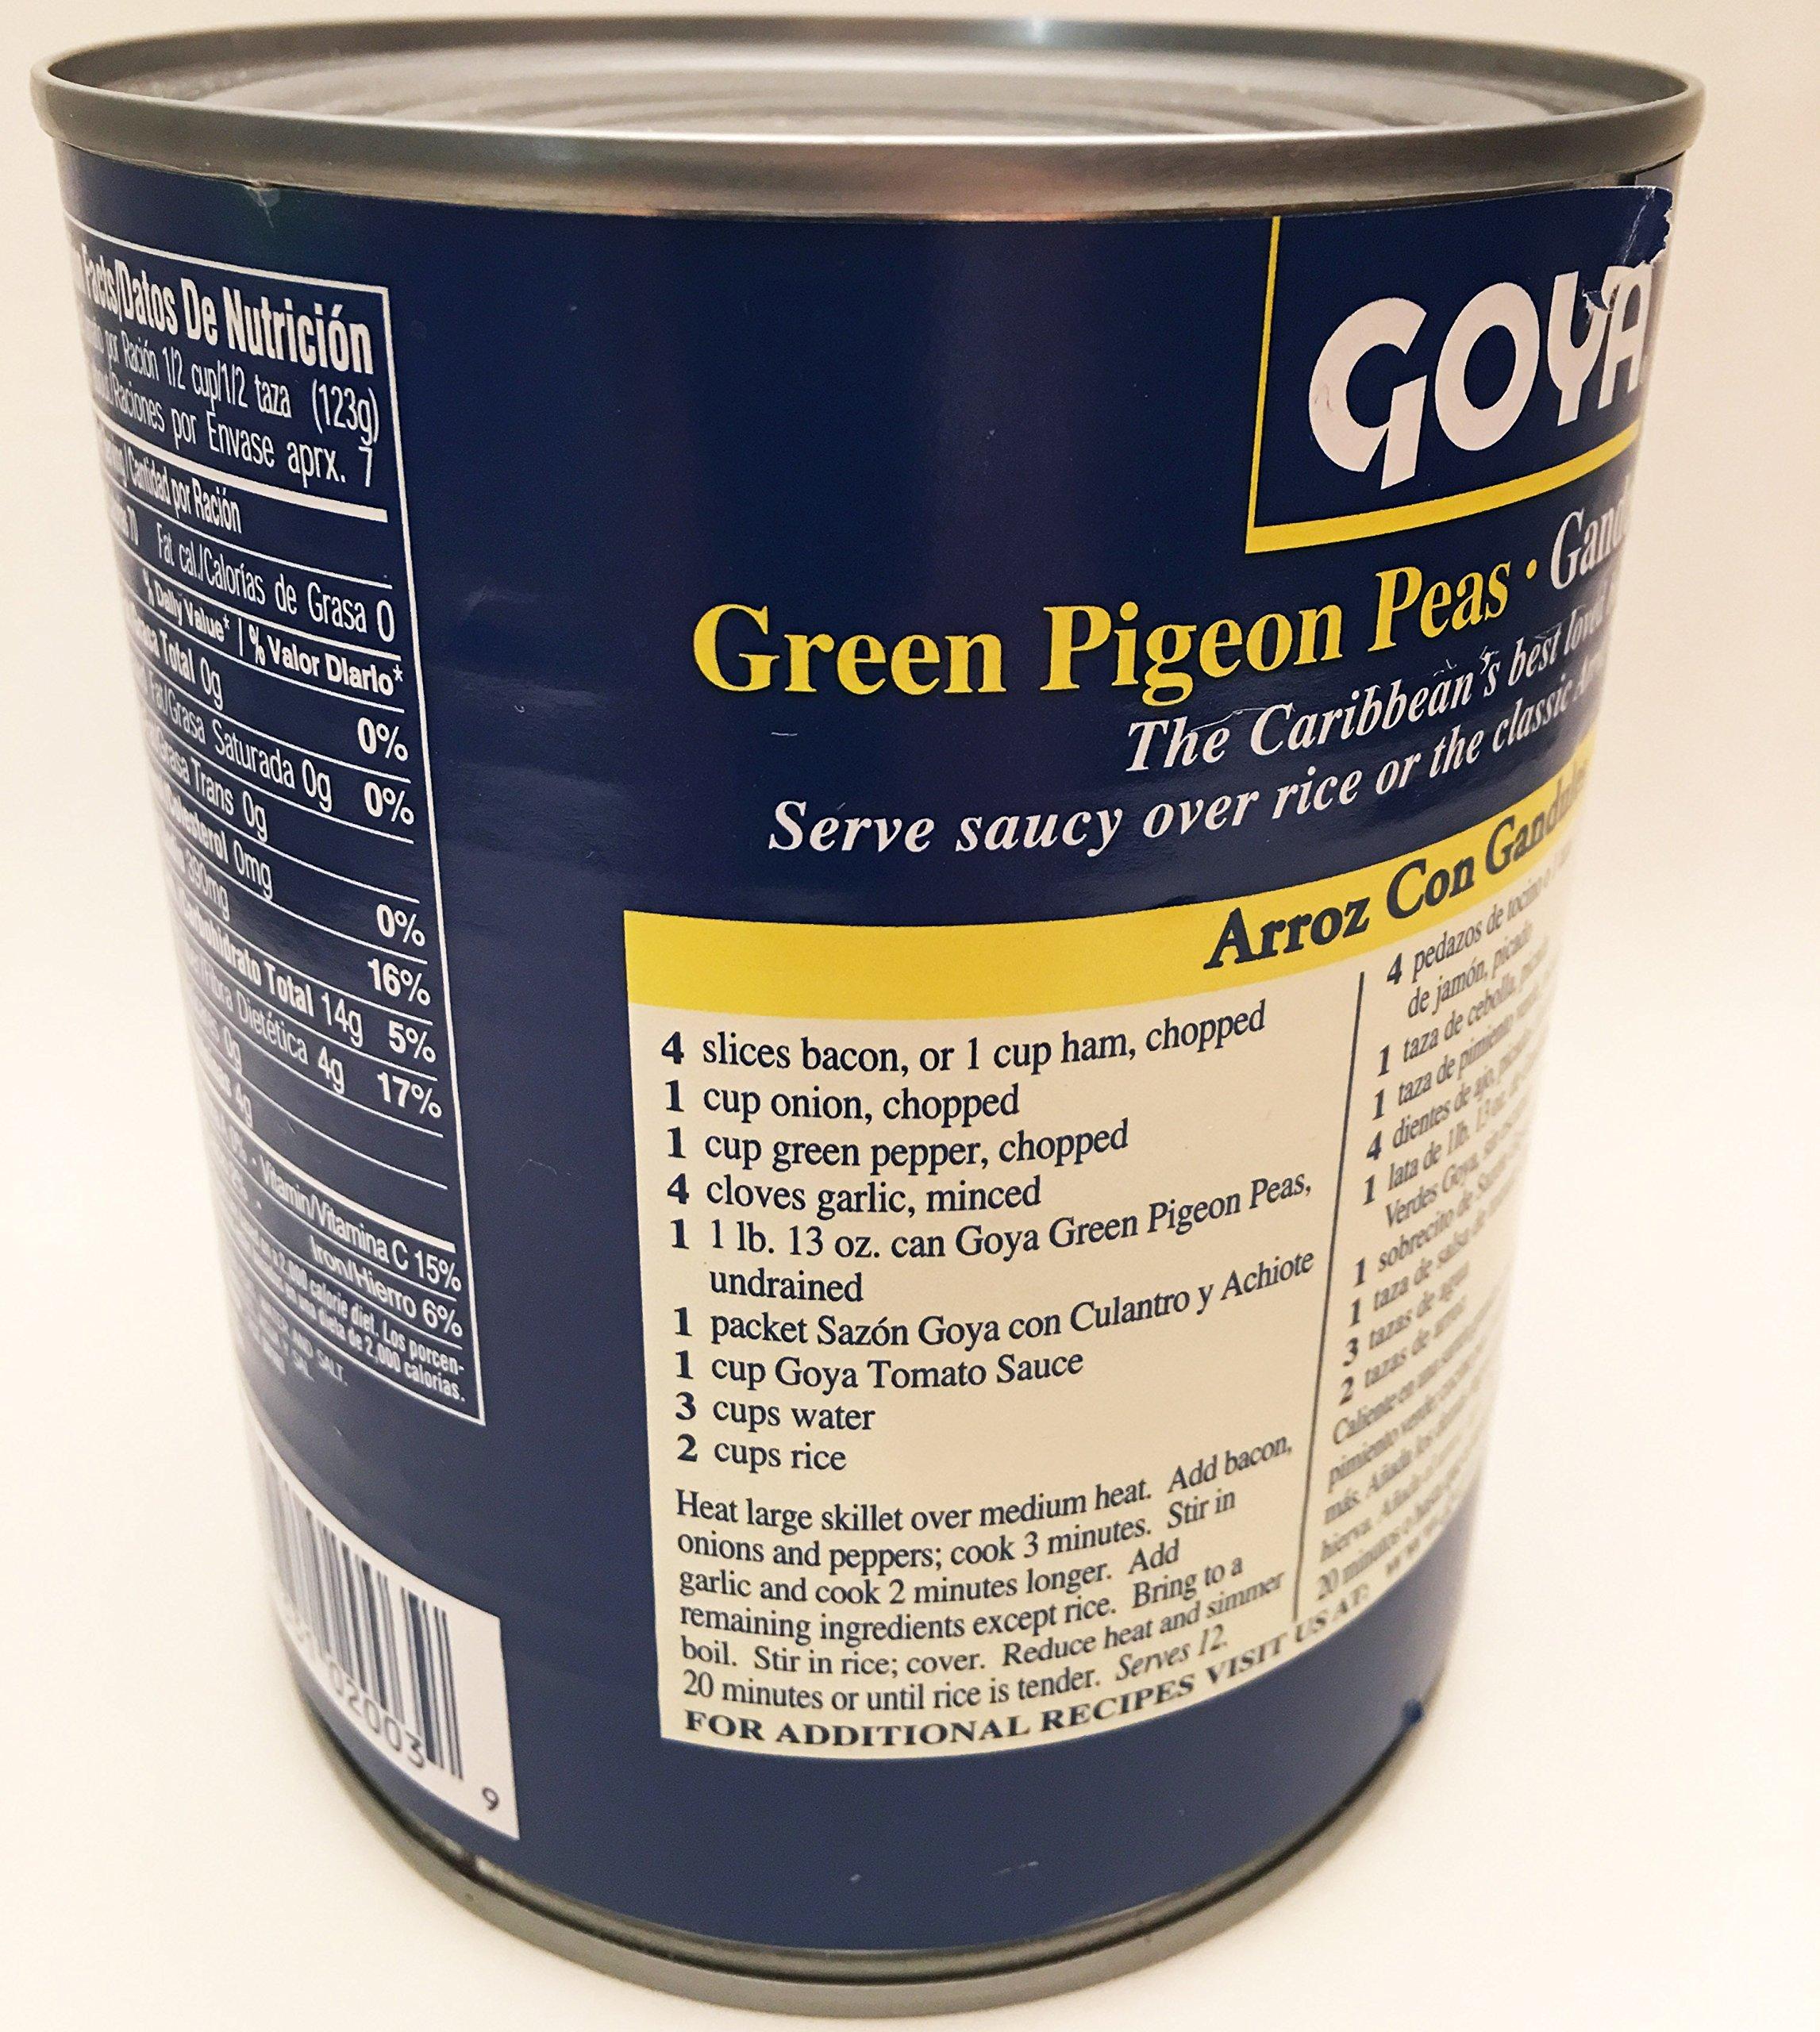 Goya Green Pigeon Peas (1lb, 13 oz can, 822G) Gandules Verdes